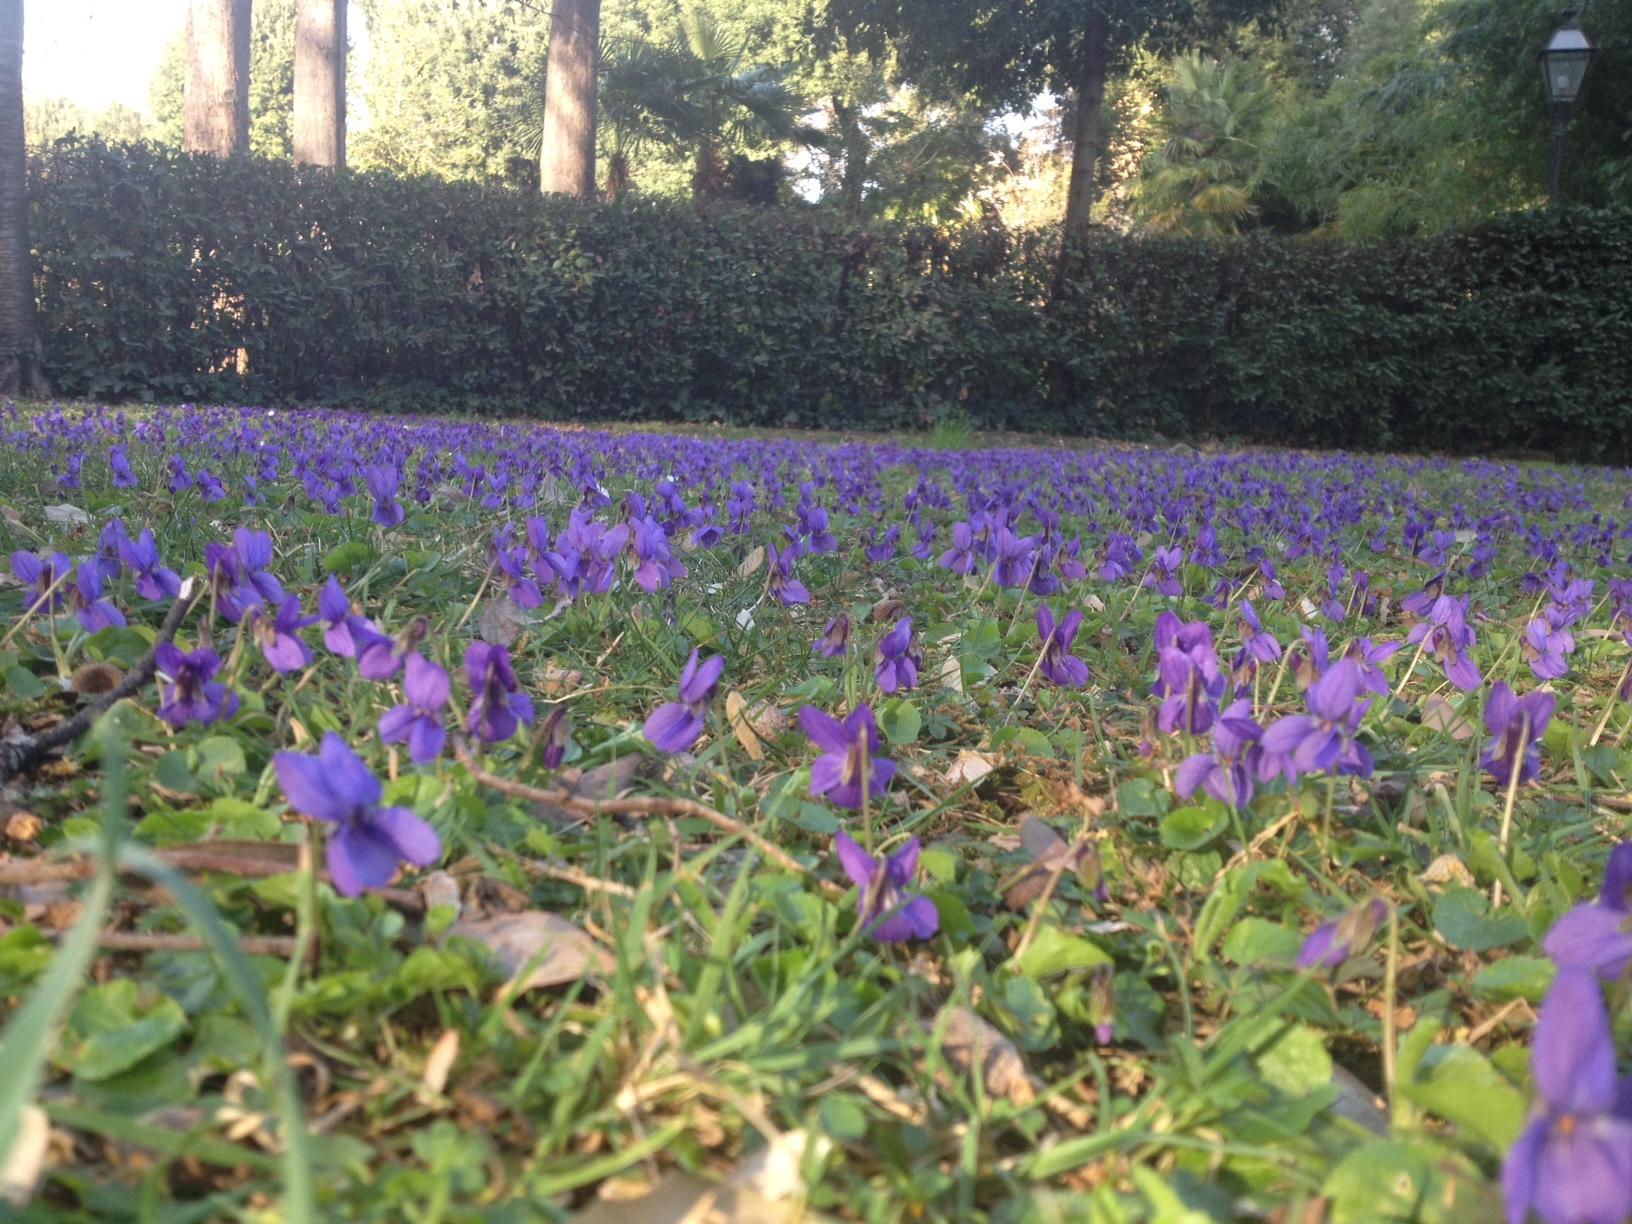 TORRIGIANI-GARDENS-FLOWERS-jessewaugh.com-4.jpg